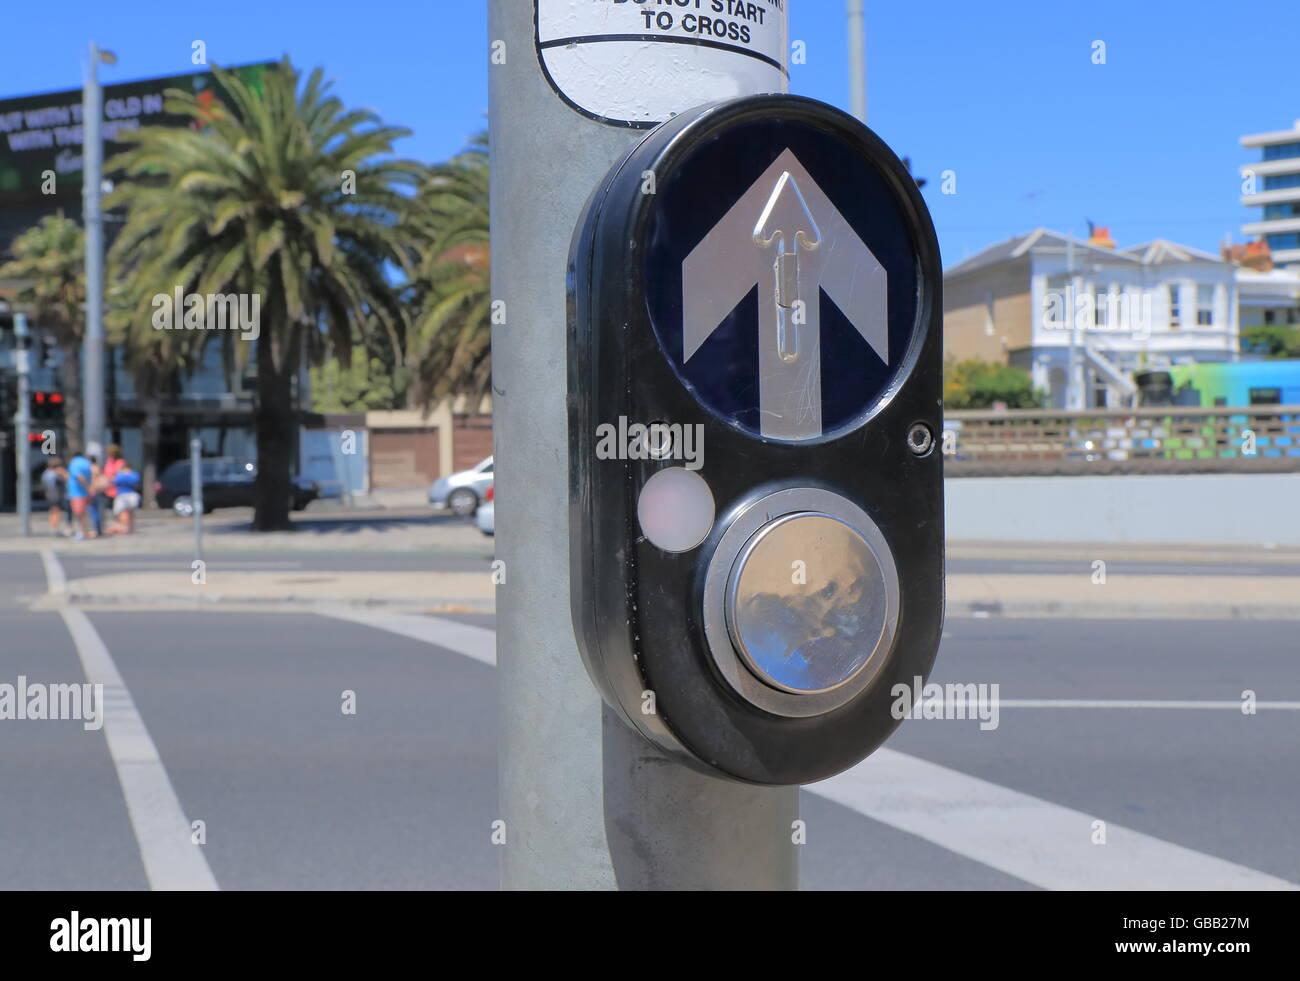 Fußgängerüberweg Summer in Australien Stockbild